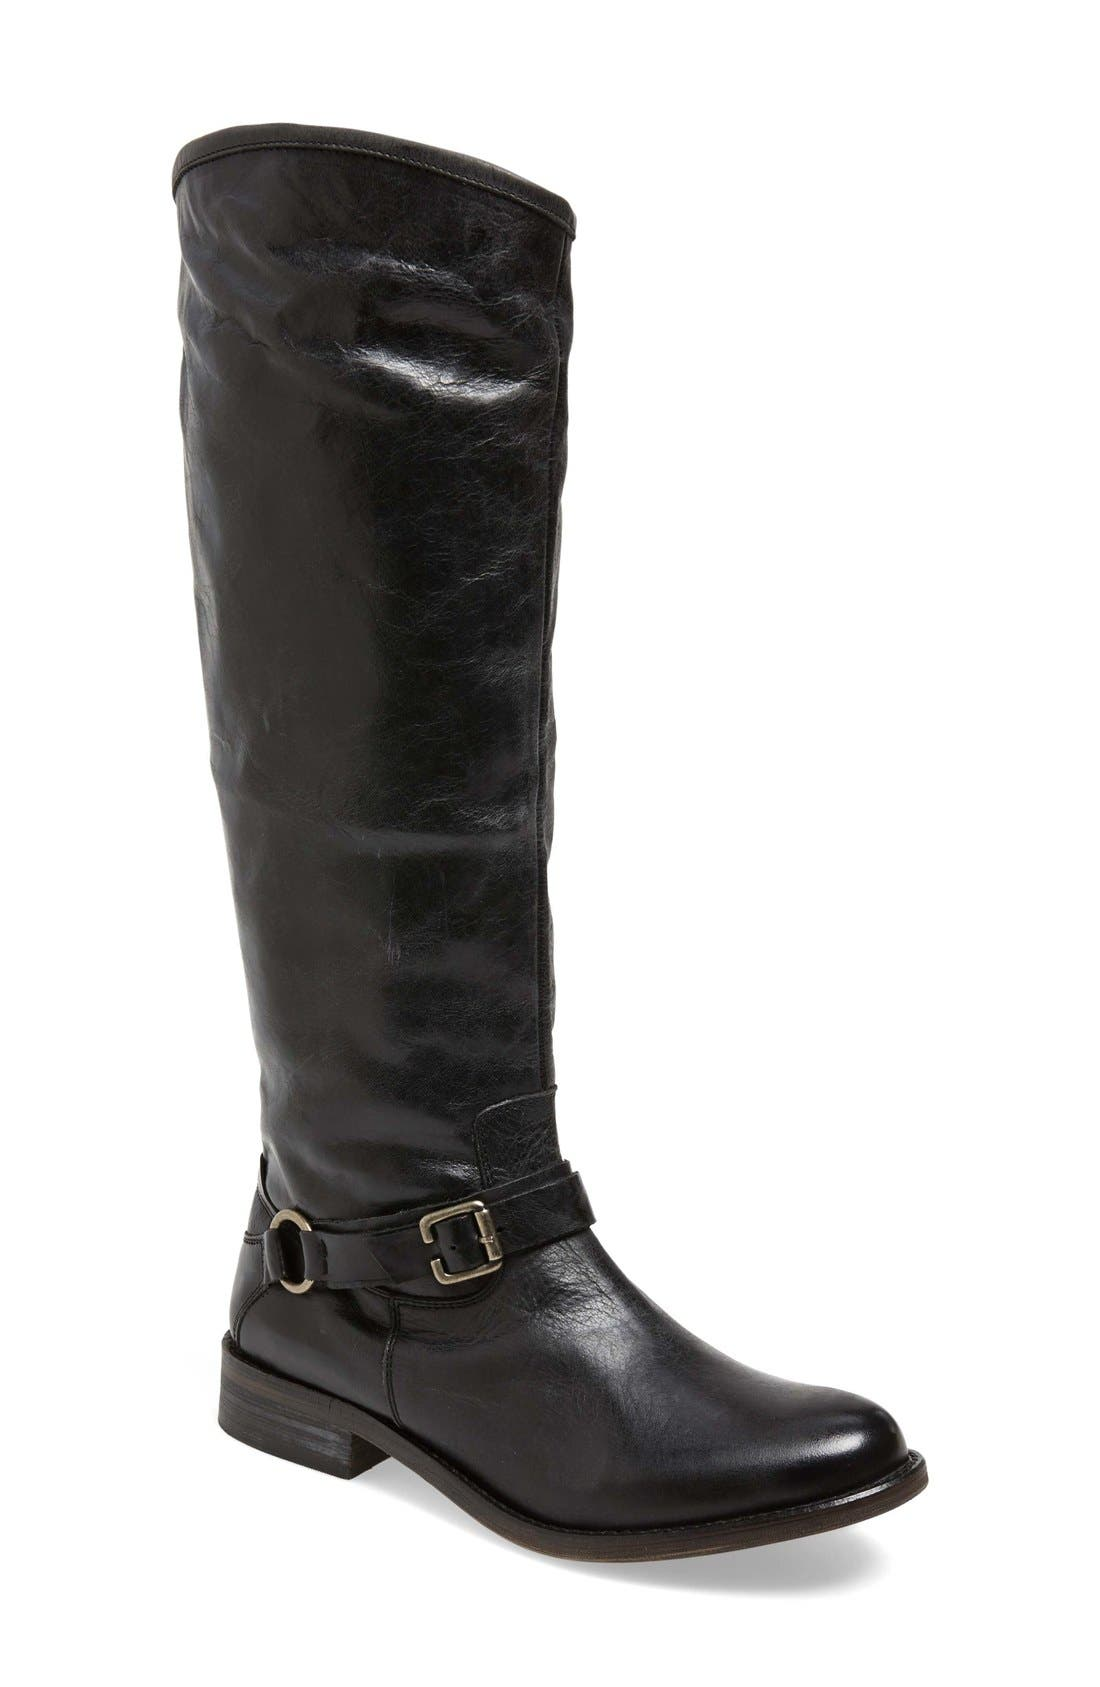 Alternate Image 1 Selected - Hinge 'Dakotah' Knee High Riding Boot (Women)